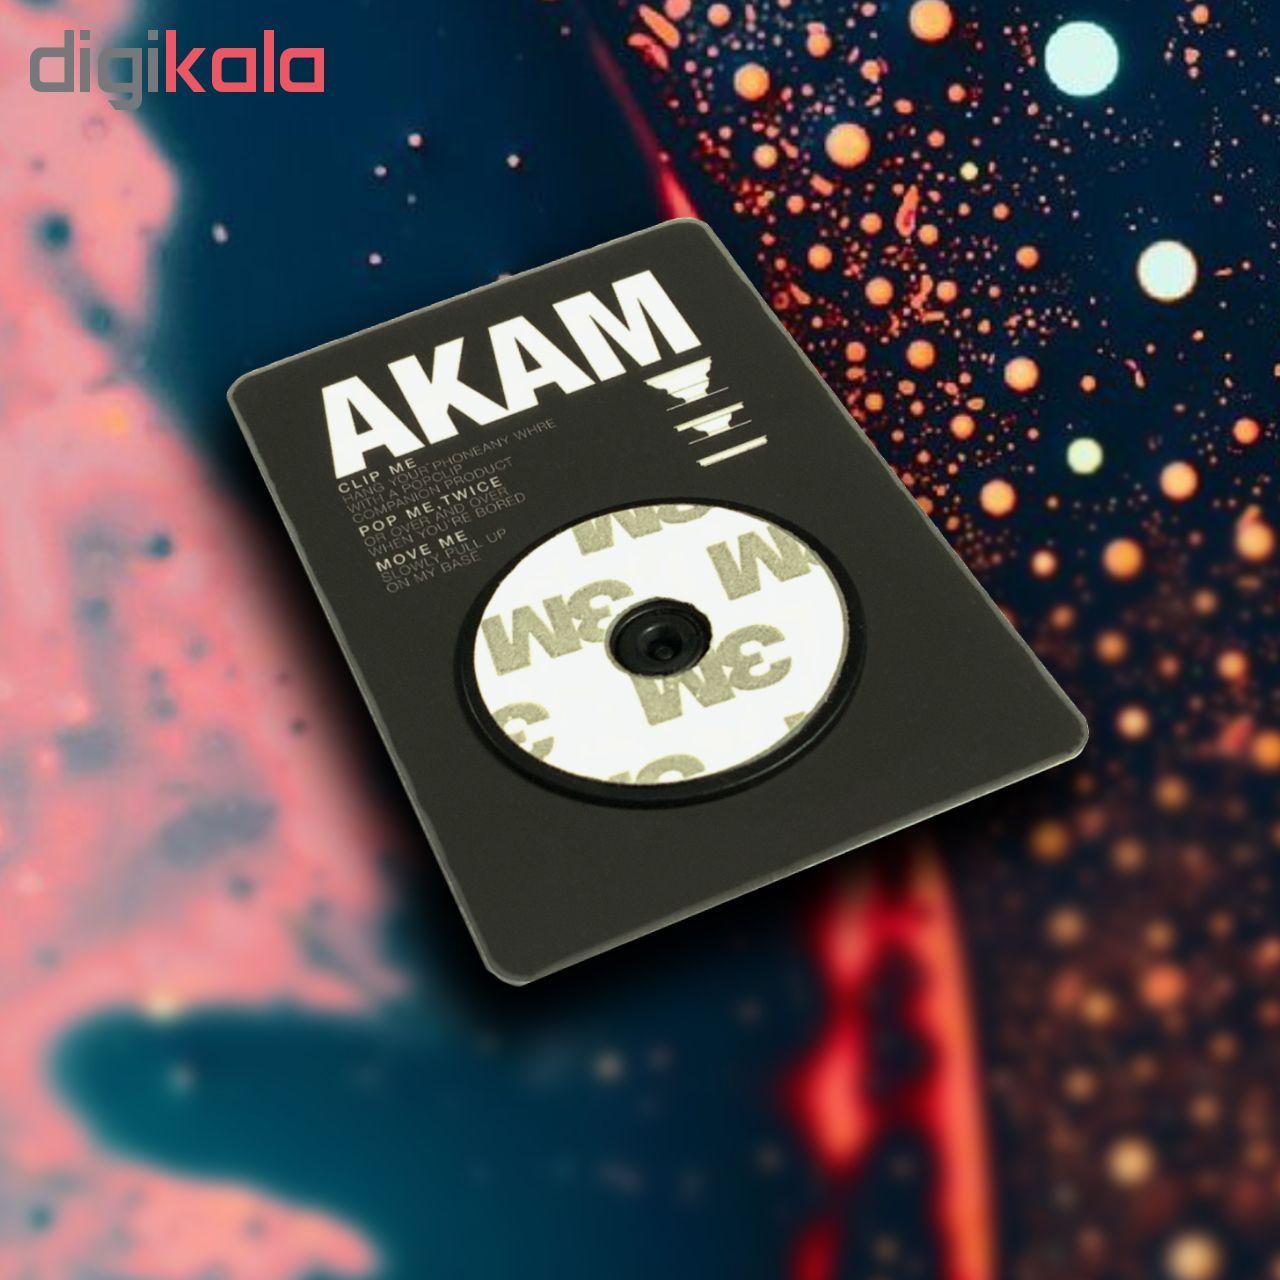 پایه نگهدارنده گوشی موبایل پاپ سوکت آکام مدل APS0079 main 1 2